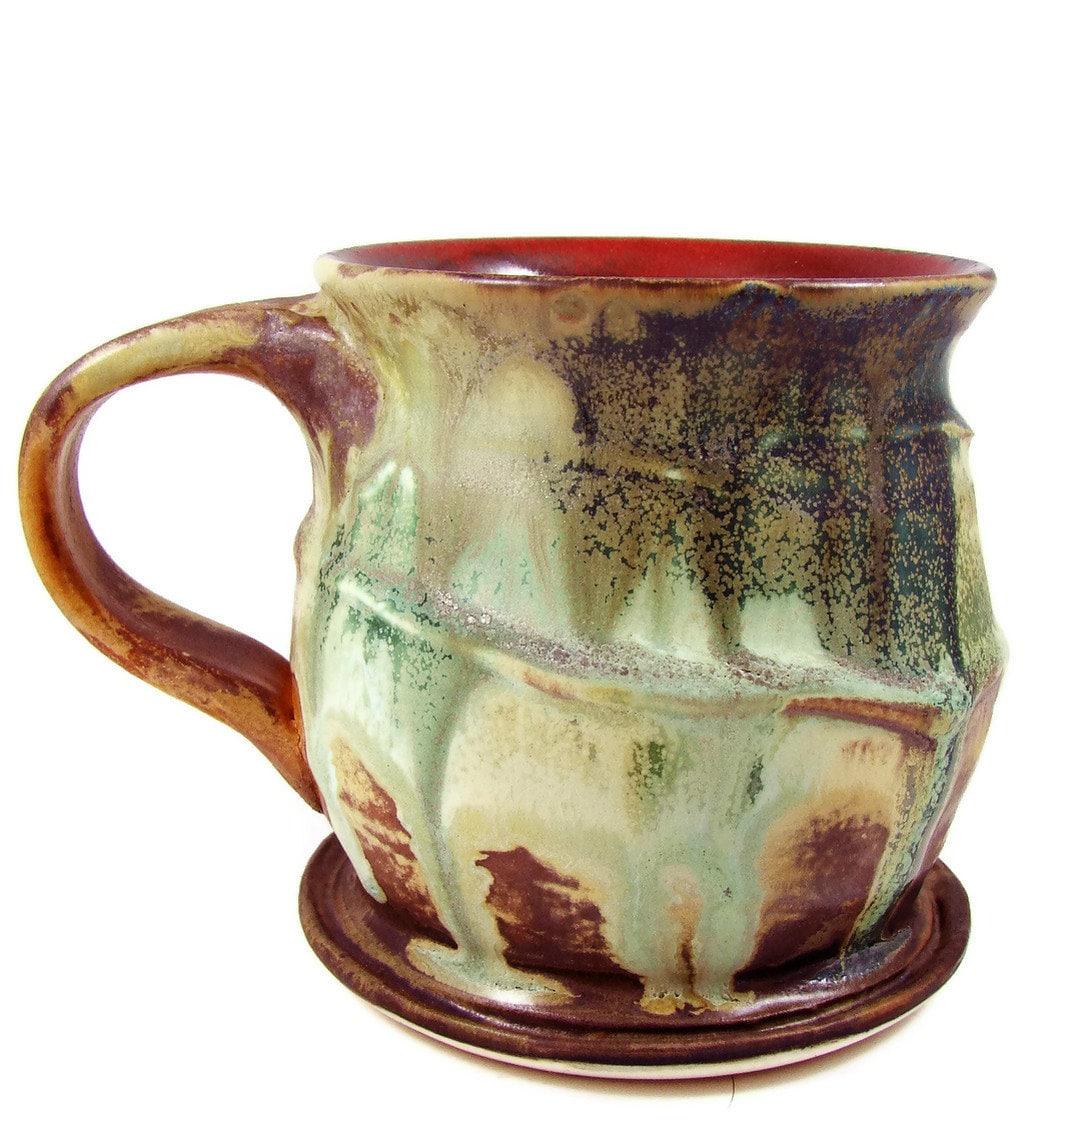 LARGE Ceramic Mug Porcelain Cup Handmade Pottery Mugs